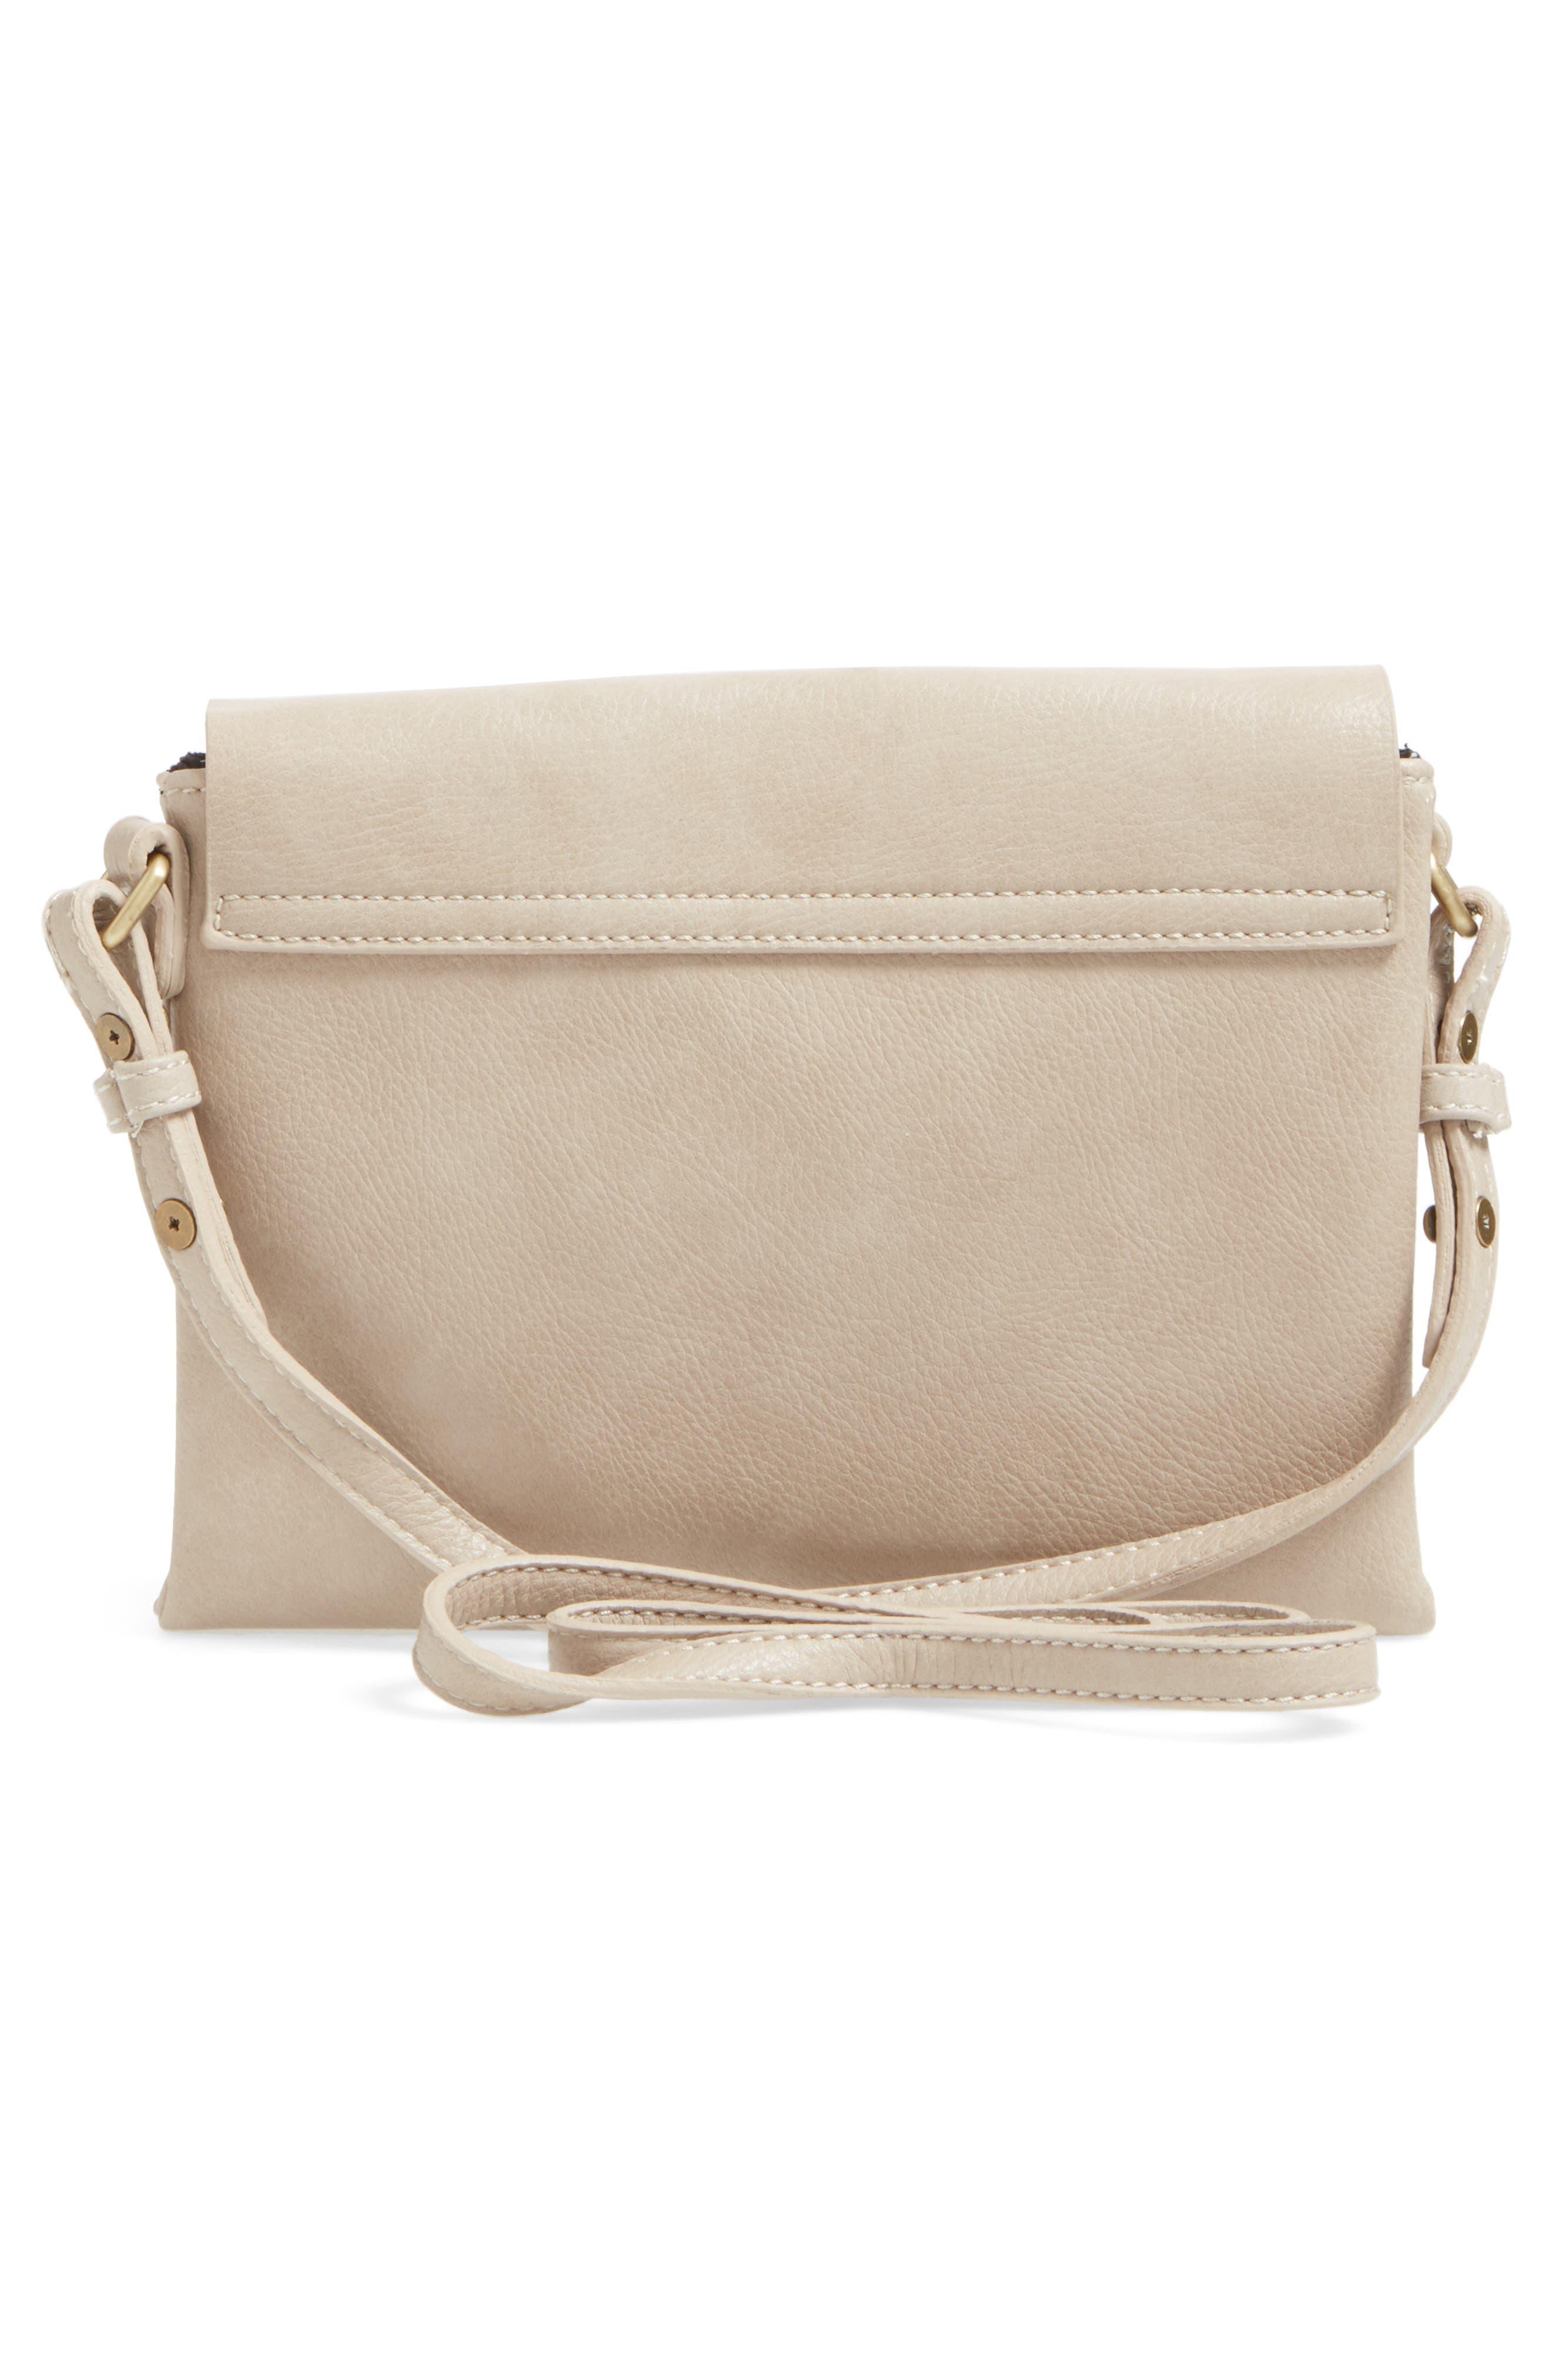 Alternate Image 3  - Street Level Faux Leather Envelope Crossbody Bag